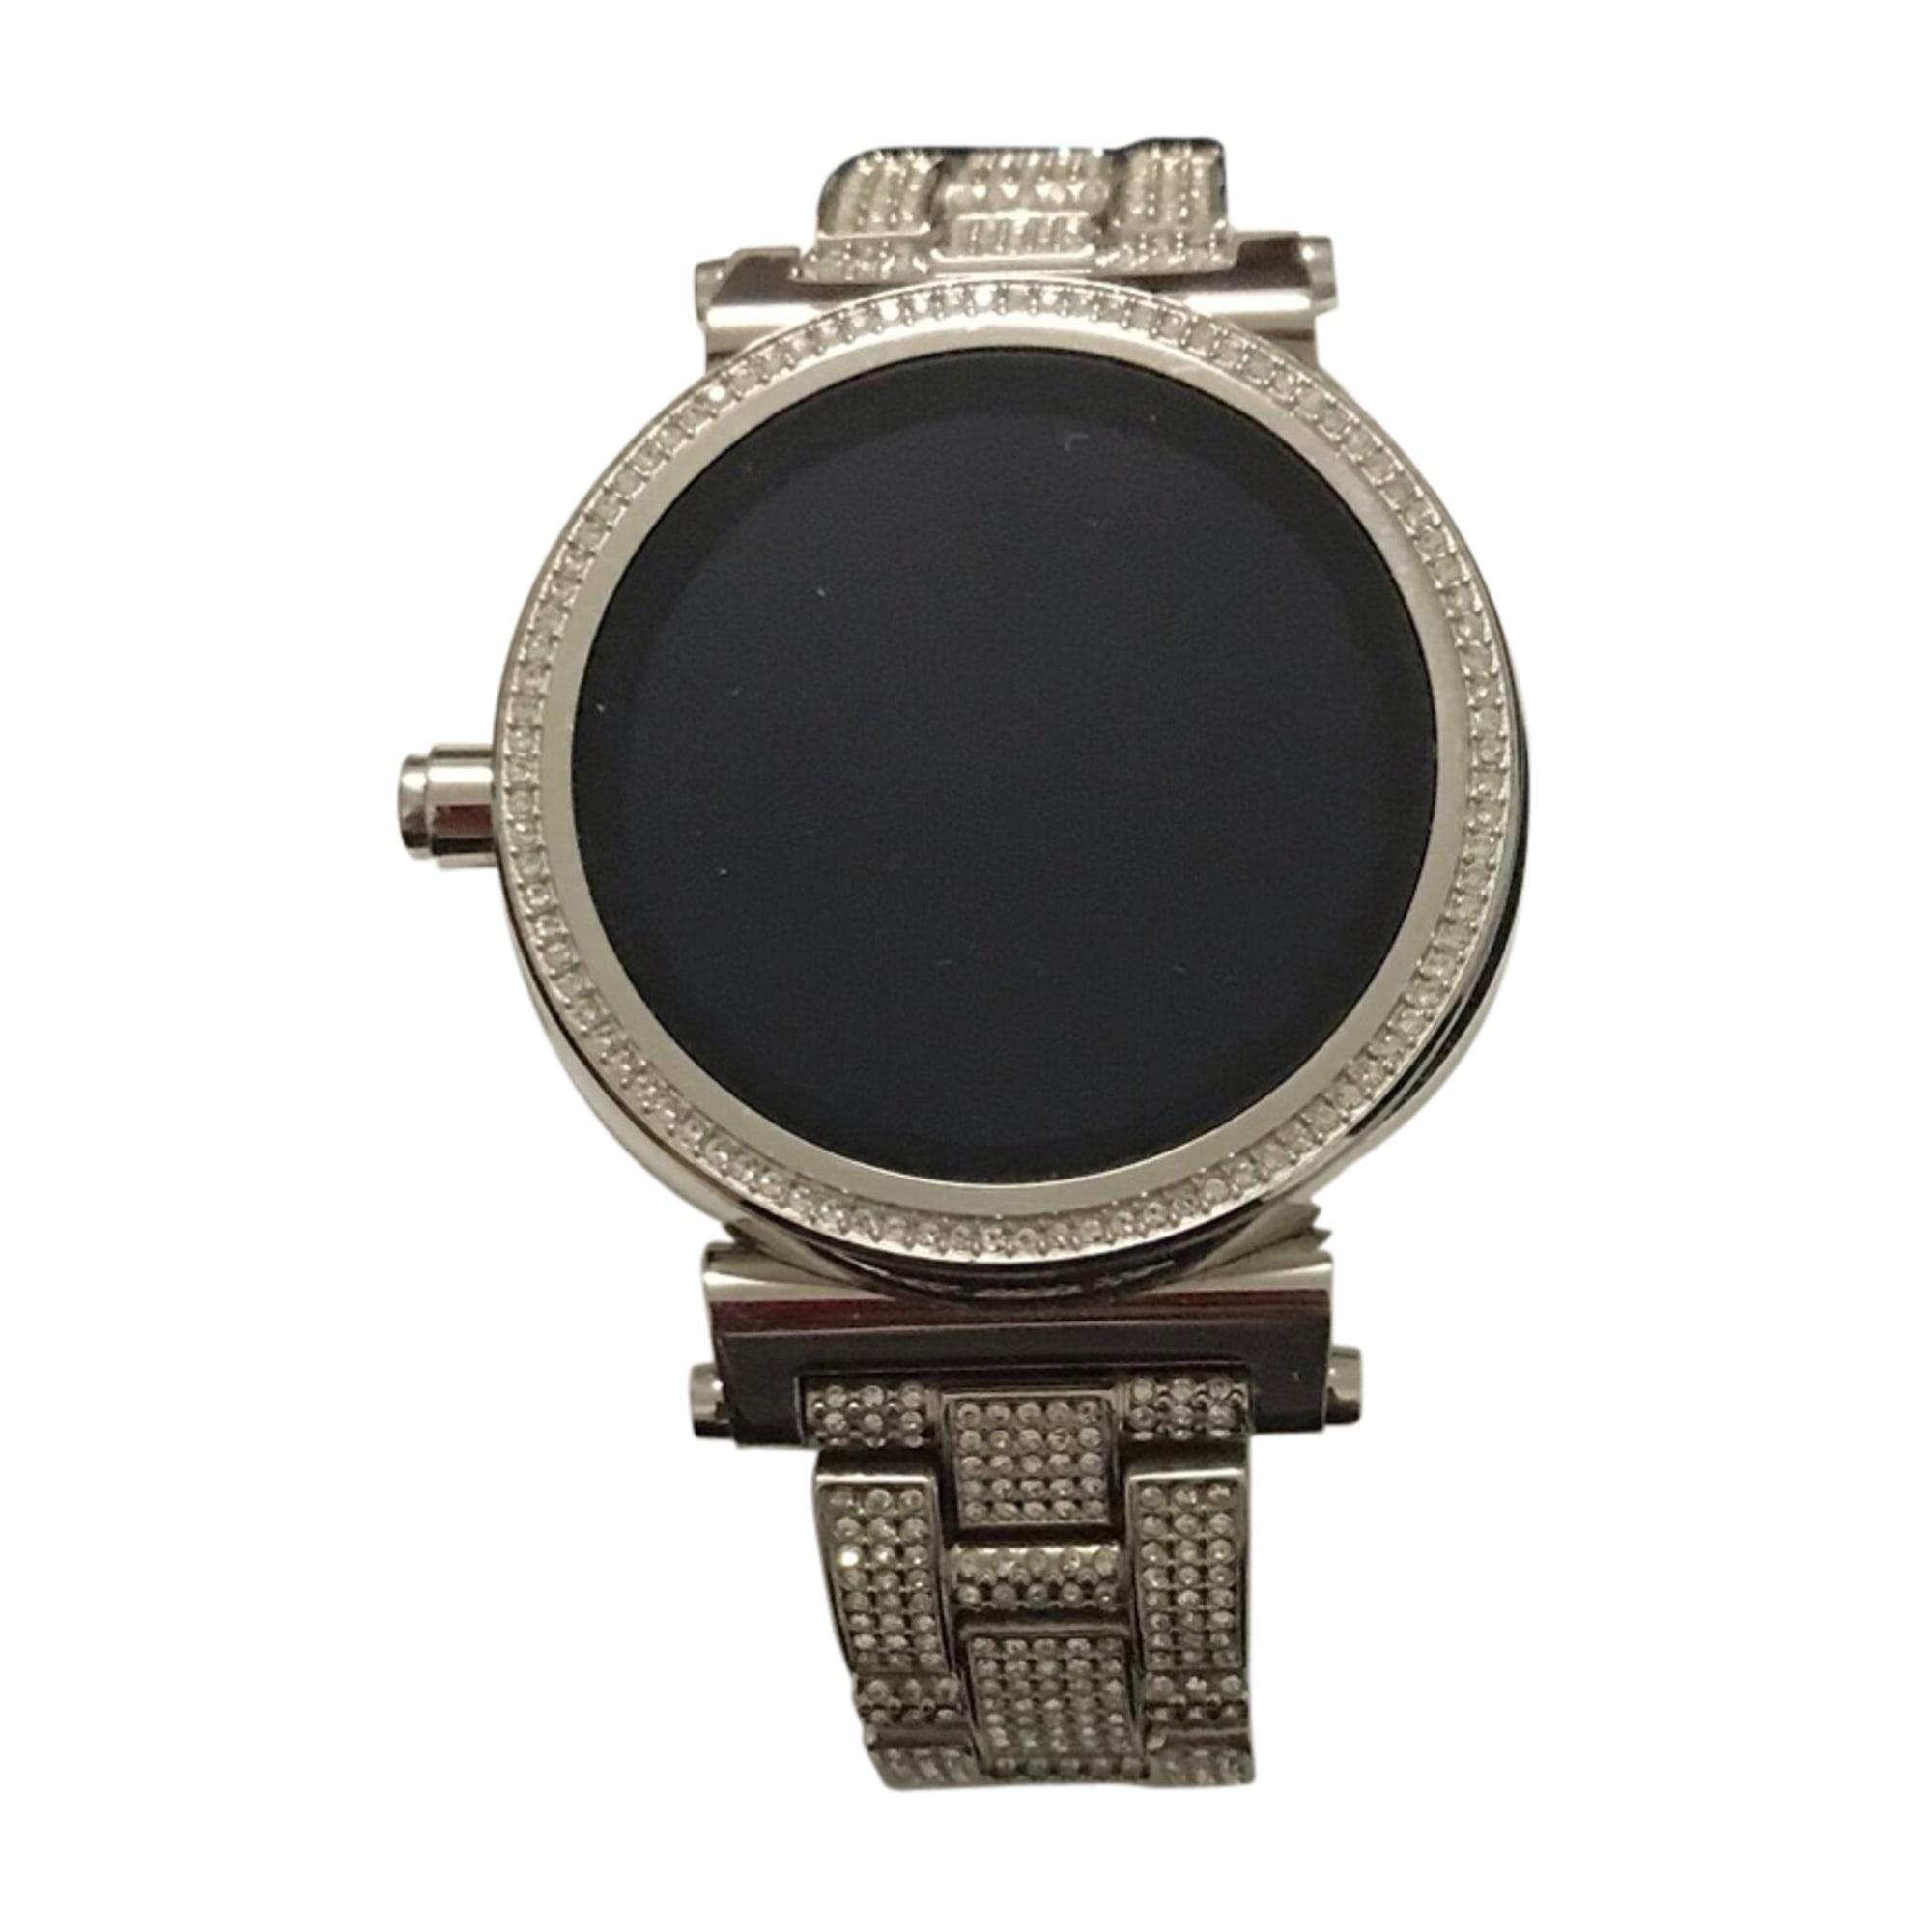 Orologio da polso MICHAEL KORS Argentato, acciaio